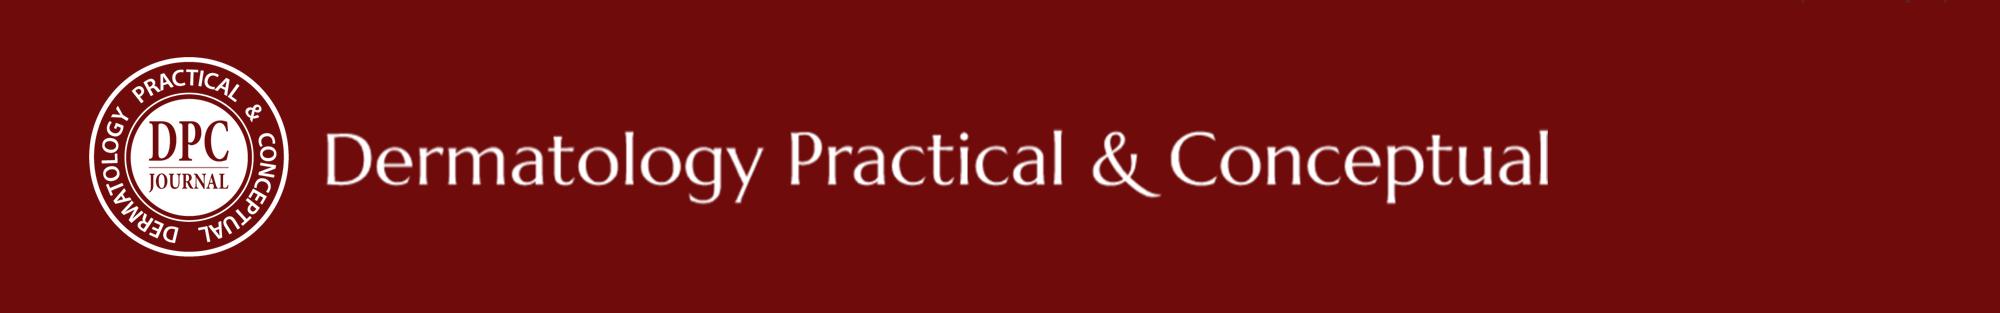 Dermatology Practical & Conceptual